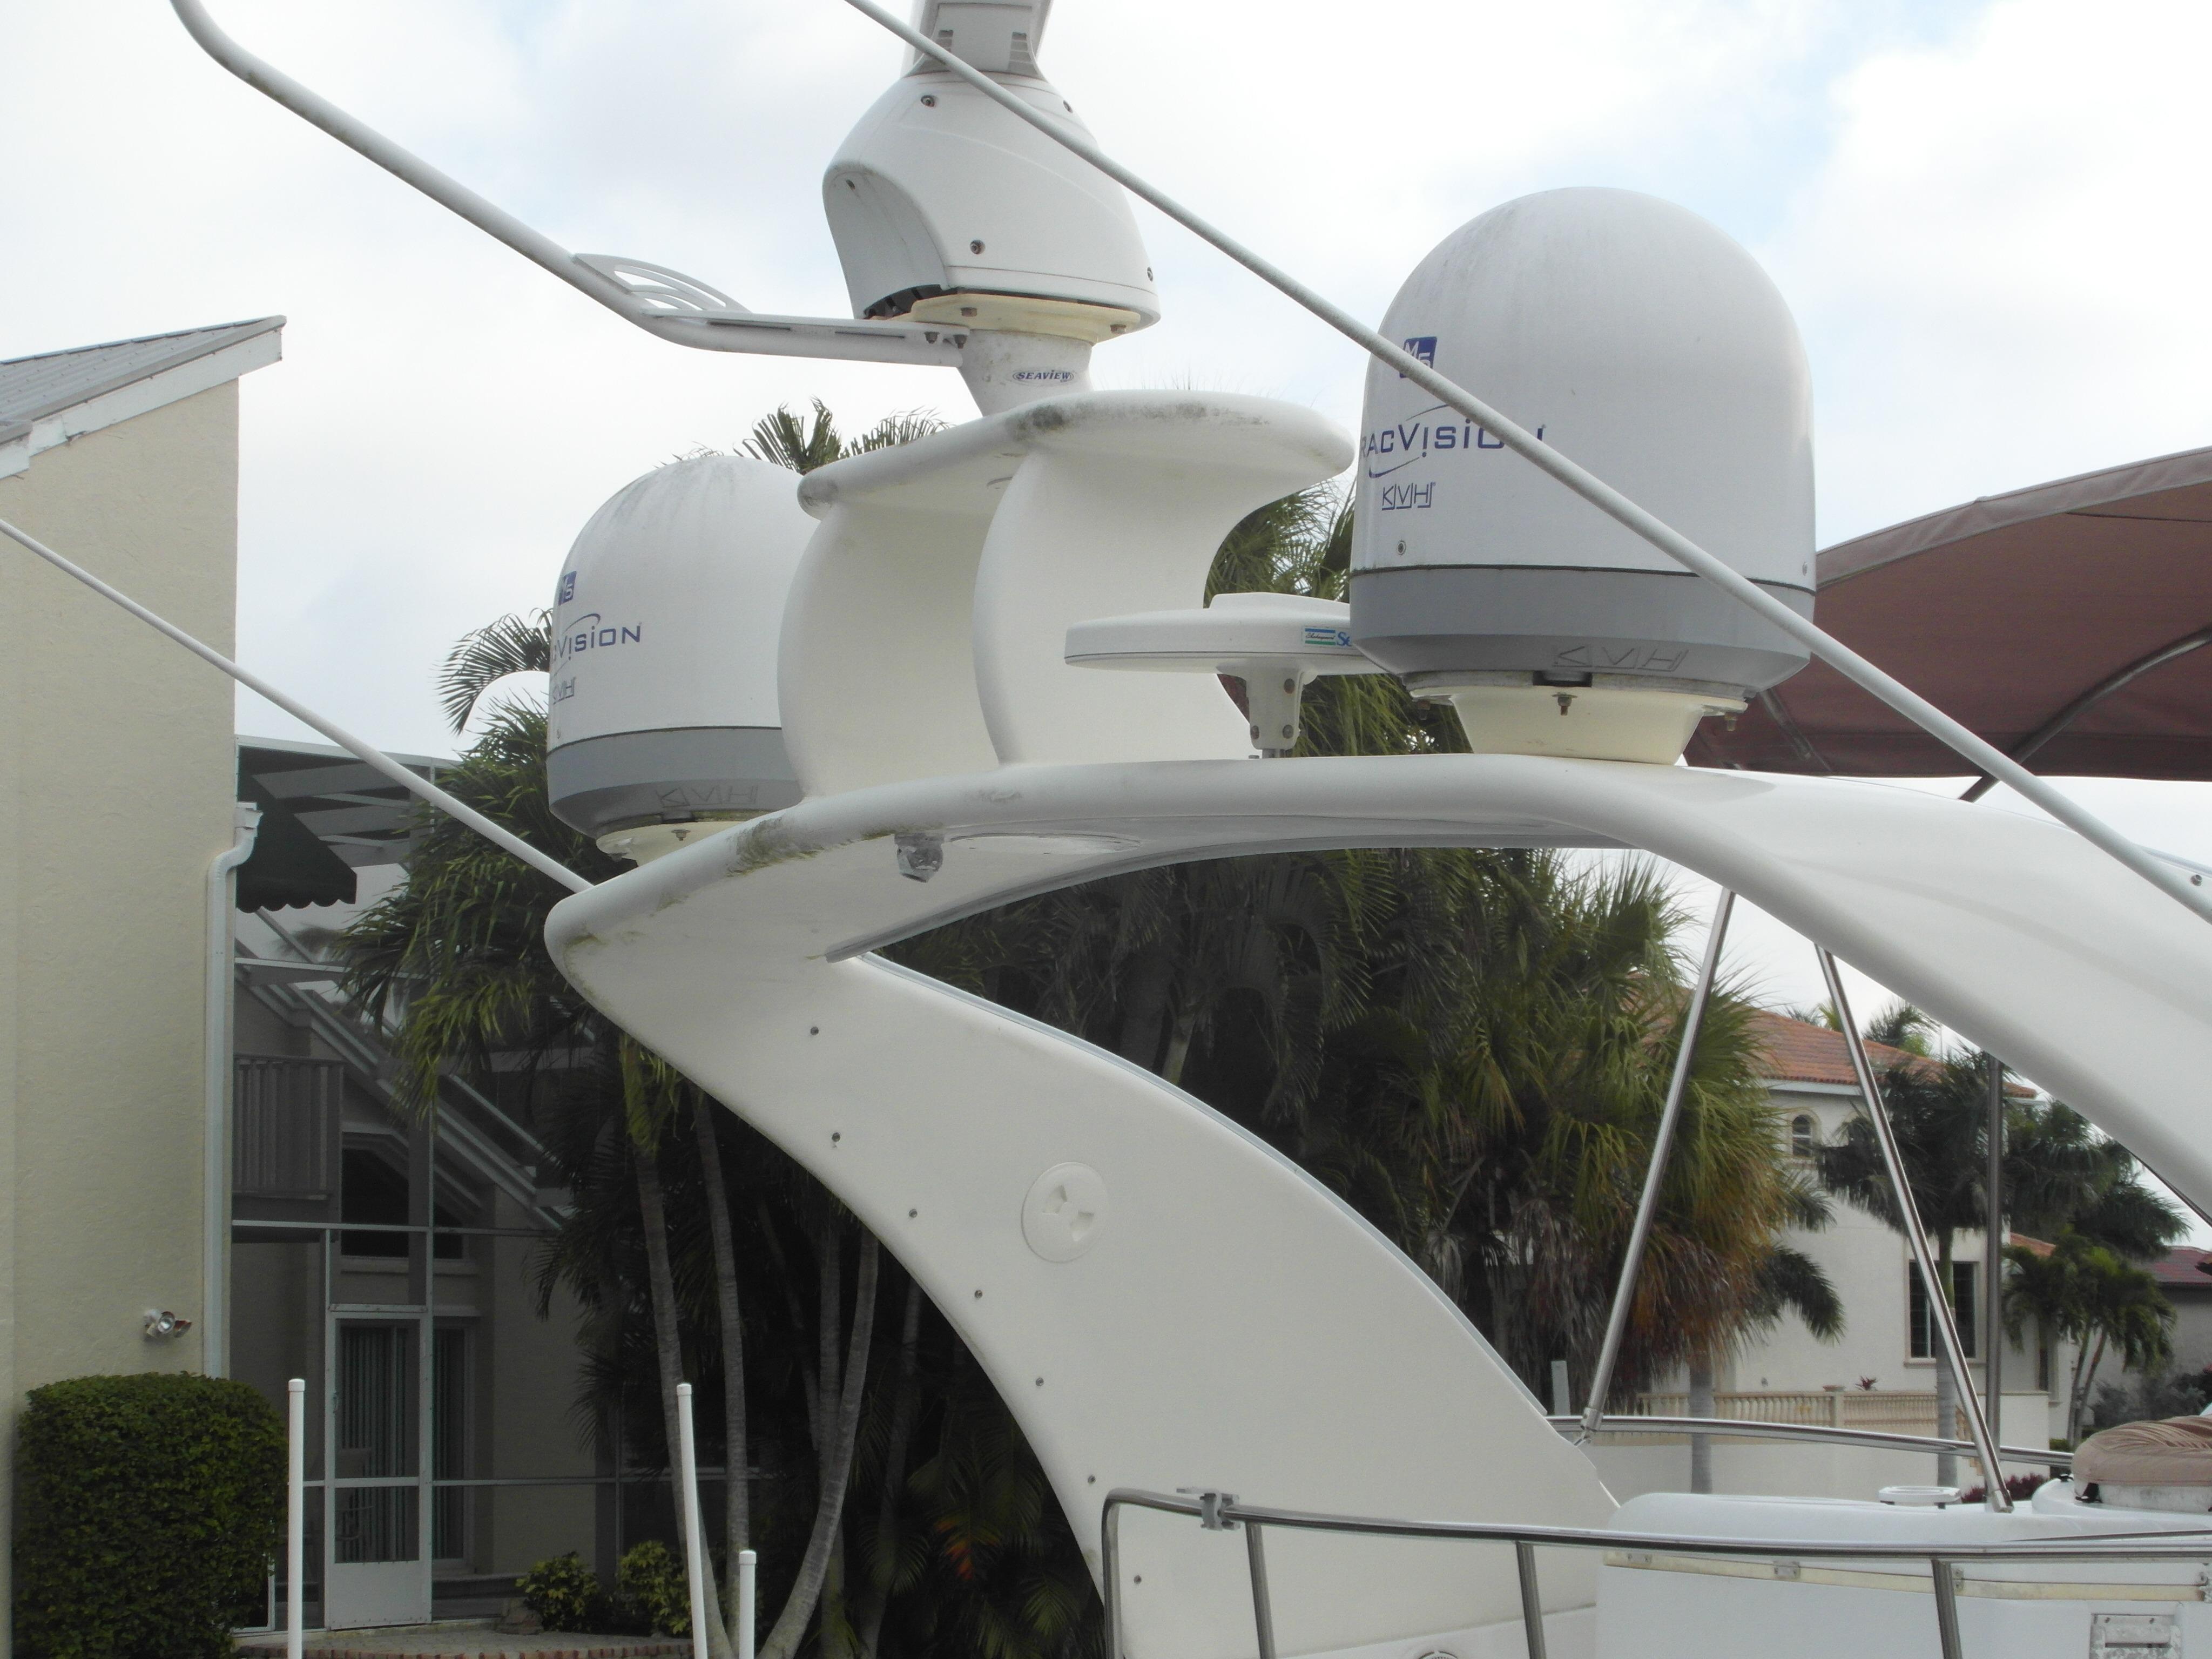 2001 Cruisers 50 Radar / Trac Vision